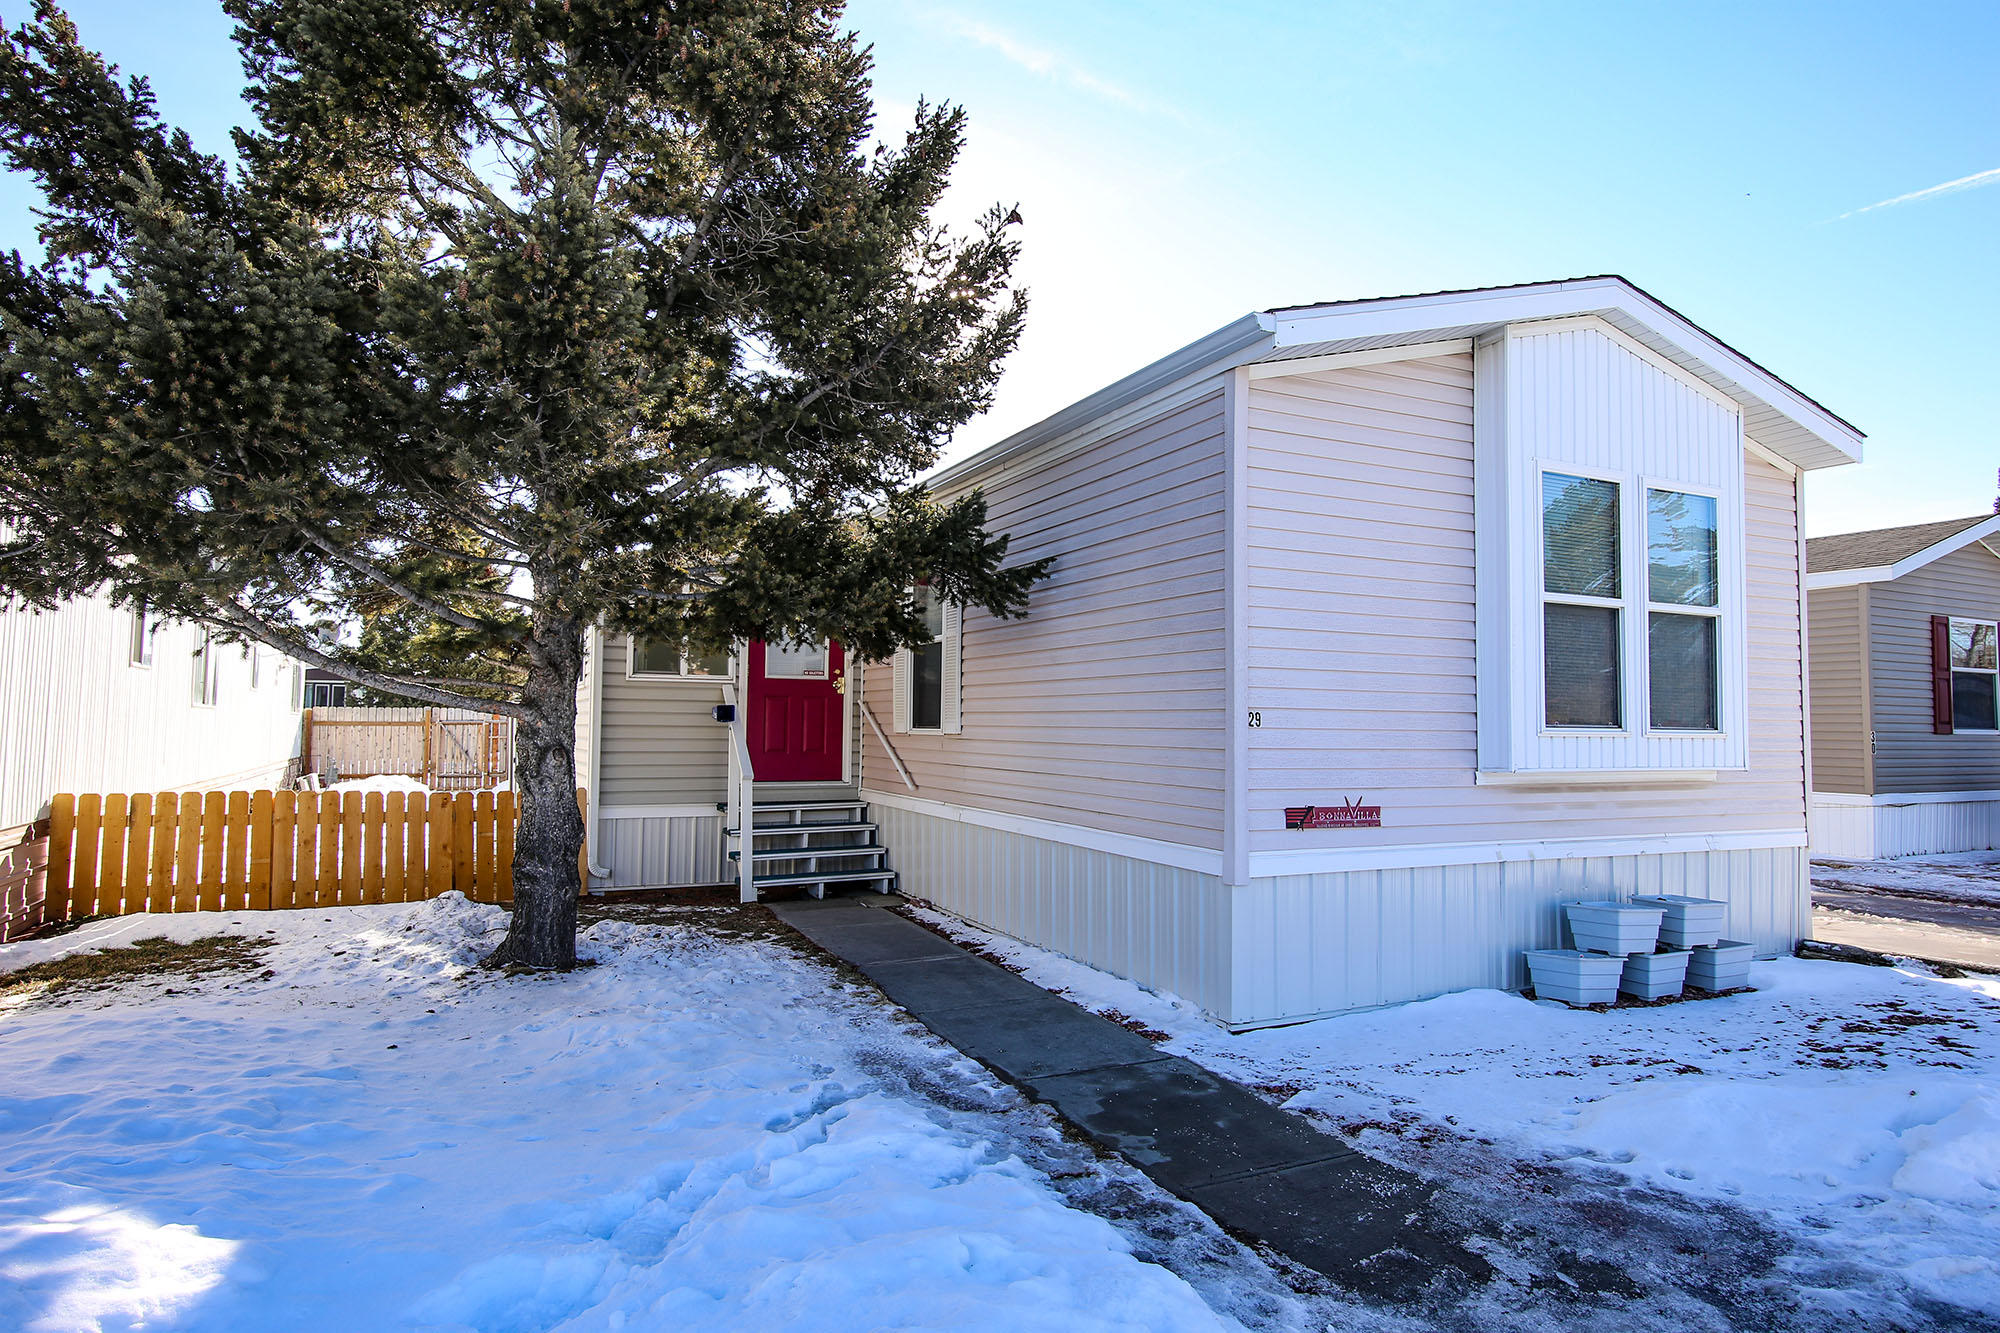 808 Avoca Avenue, Sheridan, Wyoming 82801, 3 Bedrooms Bedrooms, ,2 BathroomsBathrooms,Residential,For Sale,Avoca,19-118